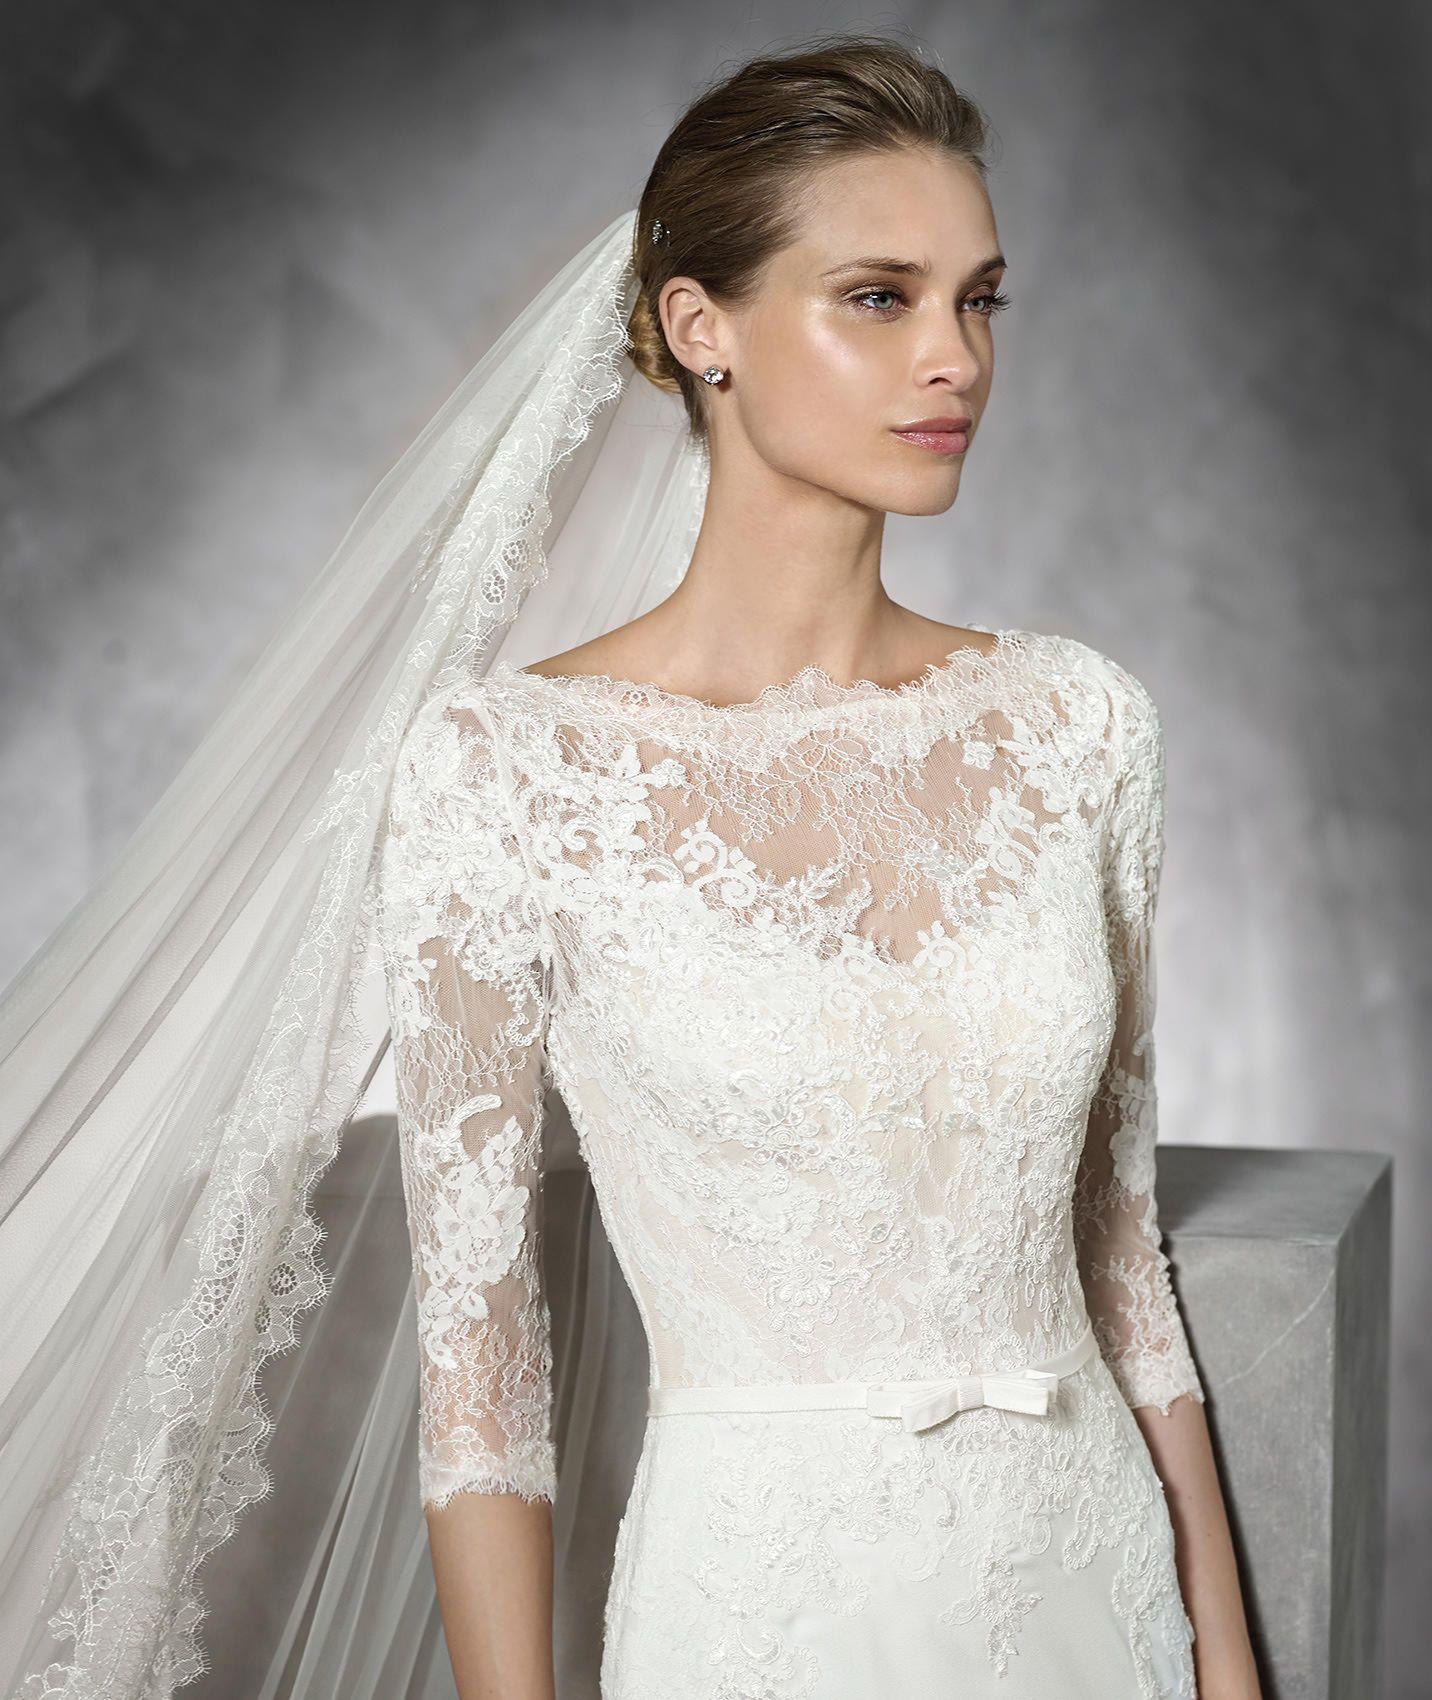 TANE, Wedding Dress 2016 | Close up wedding gown designs | Pinterest